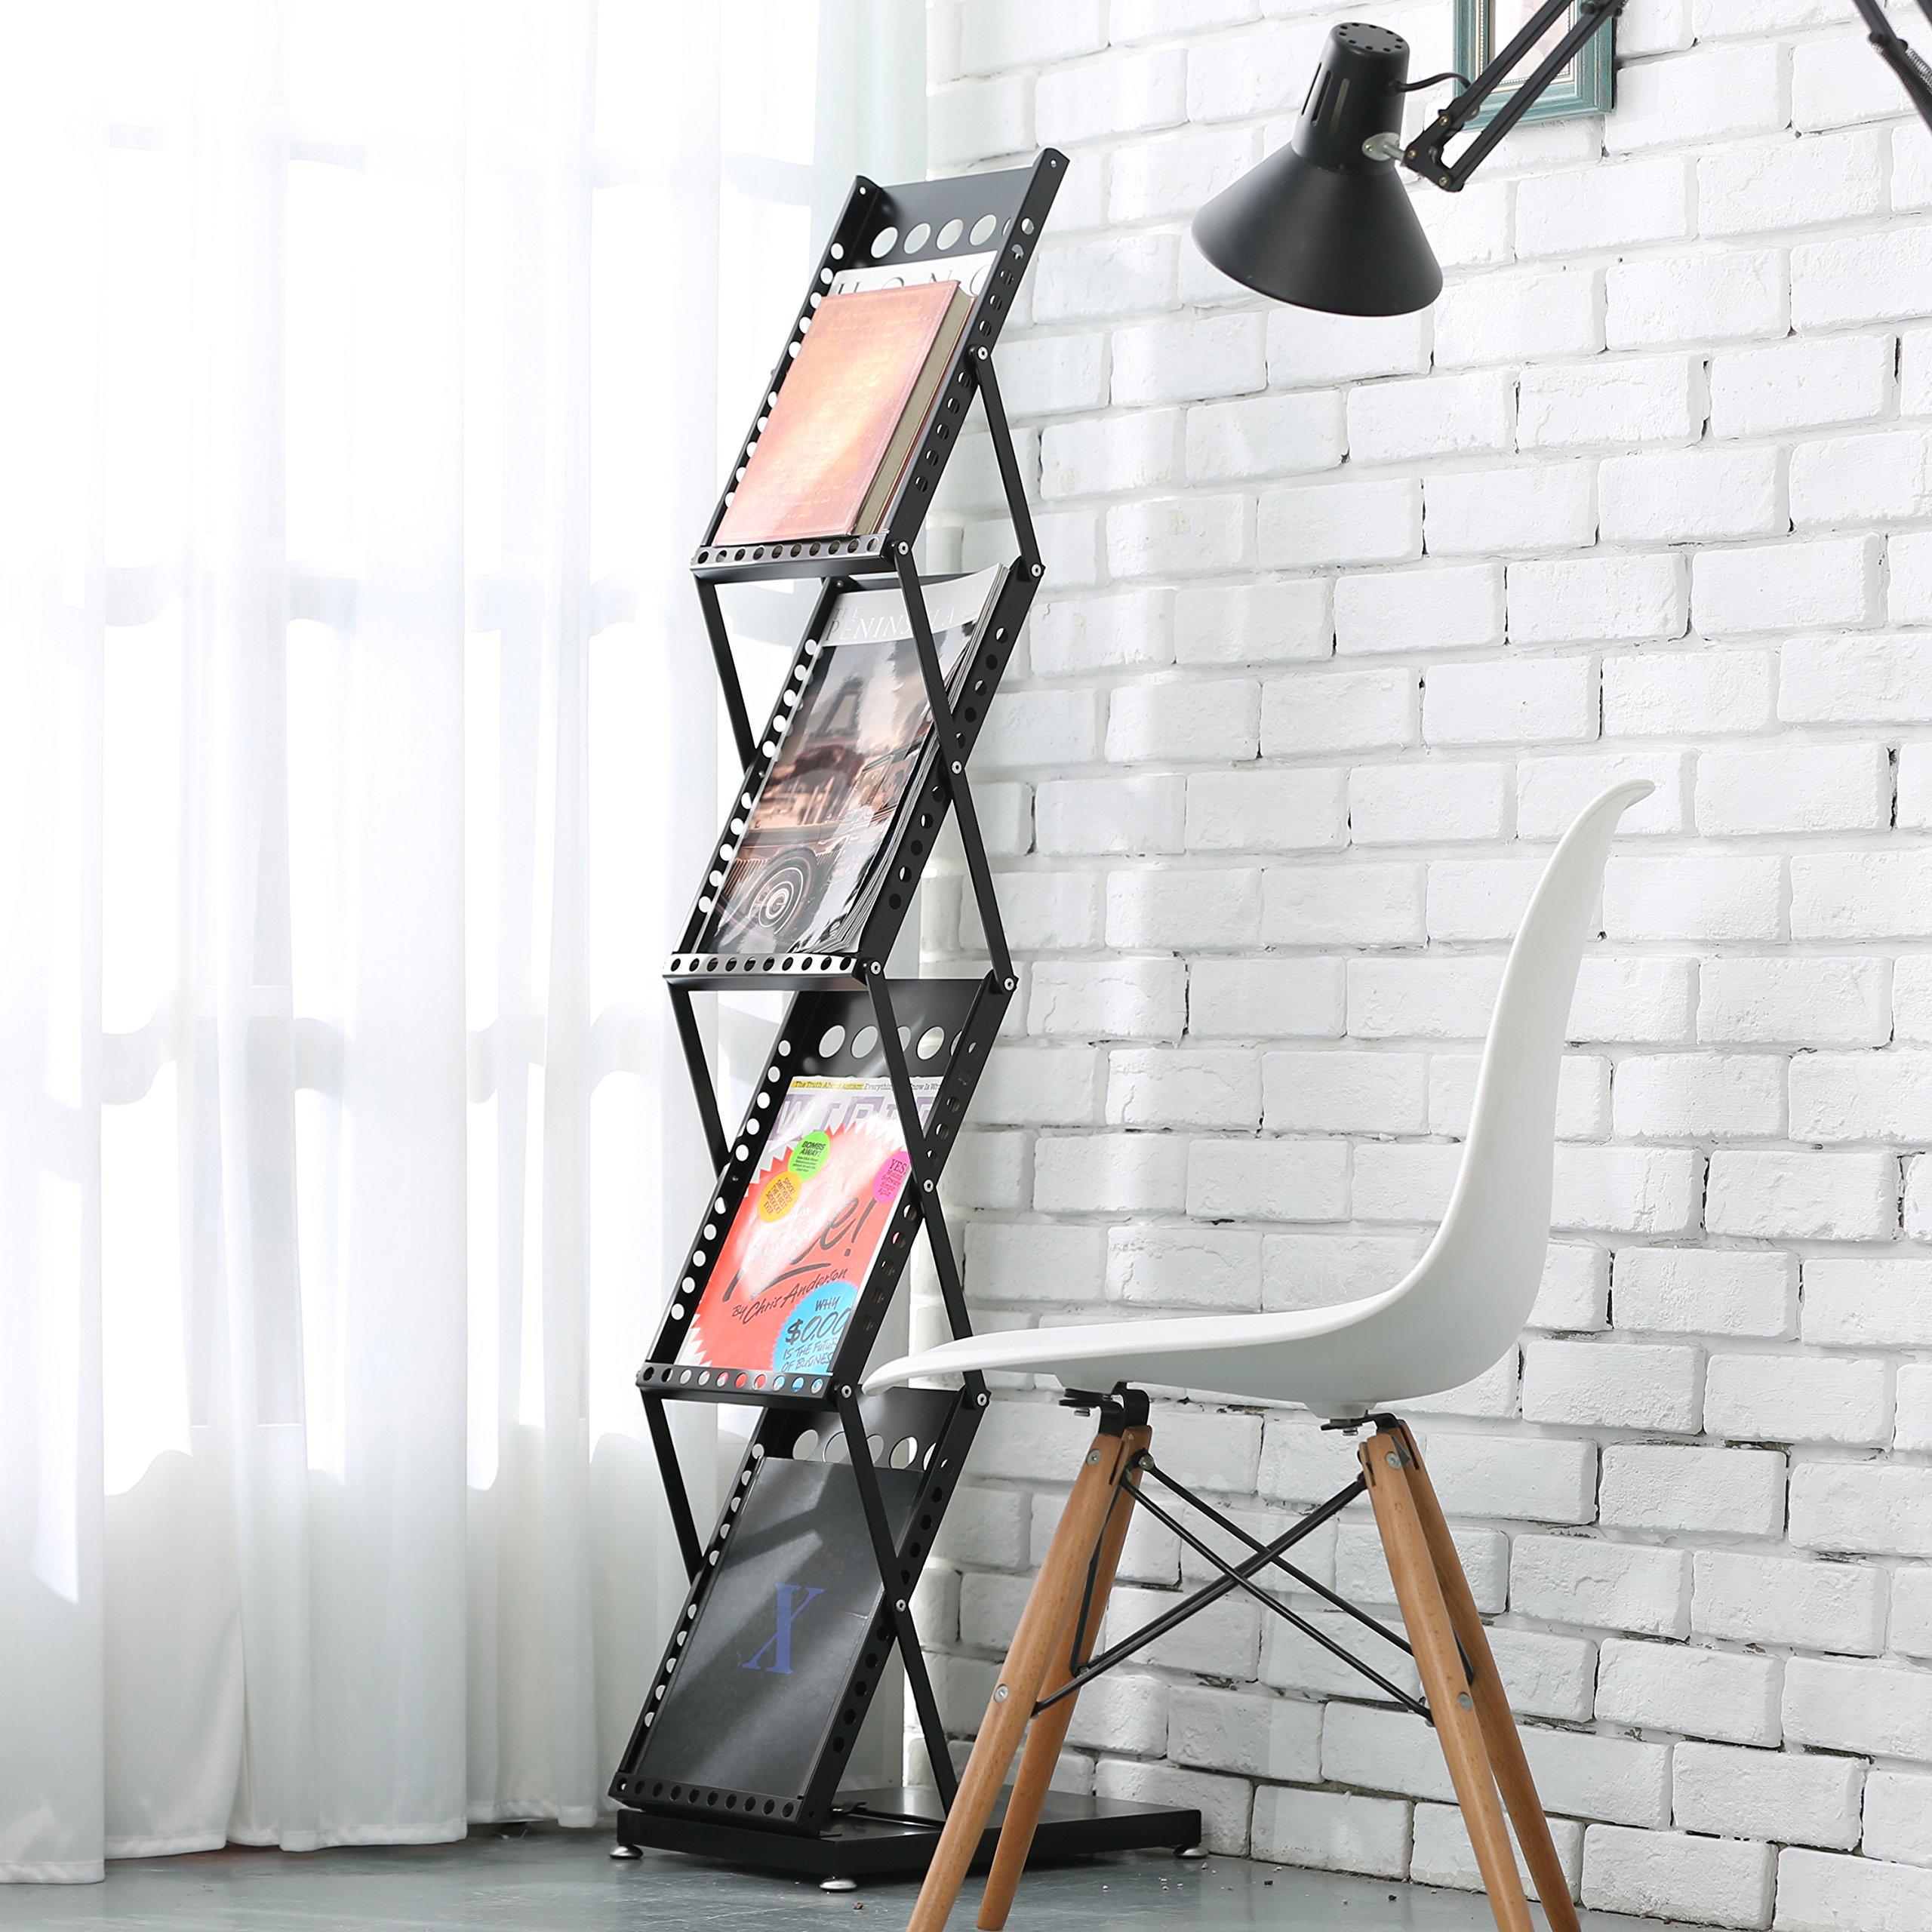 Modern Folding 4 Tier Metal Magazine Rack, Freestanding Literature Display Stand, Black by MyGift (Image #3)